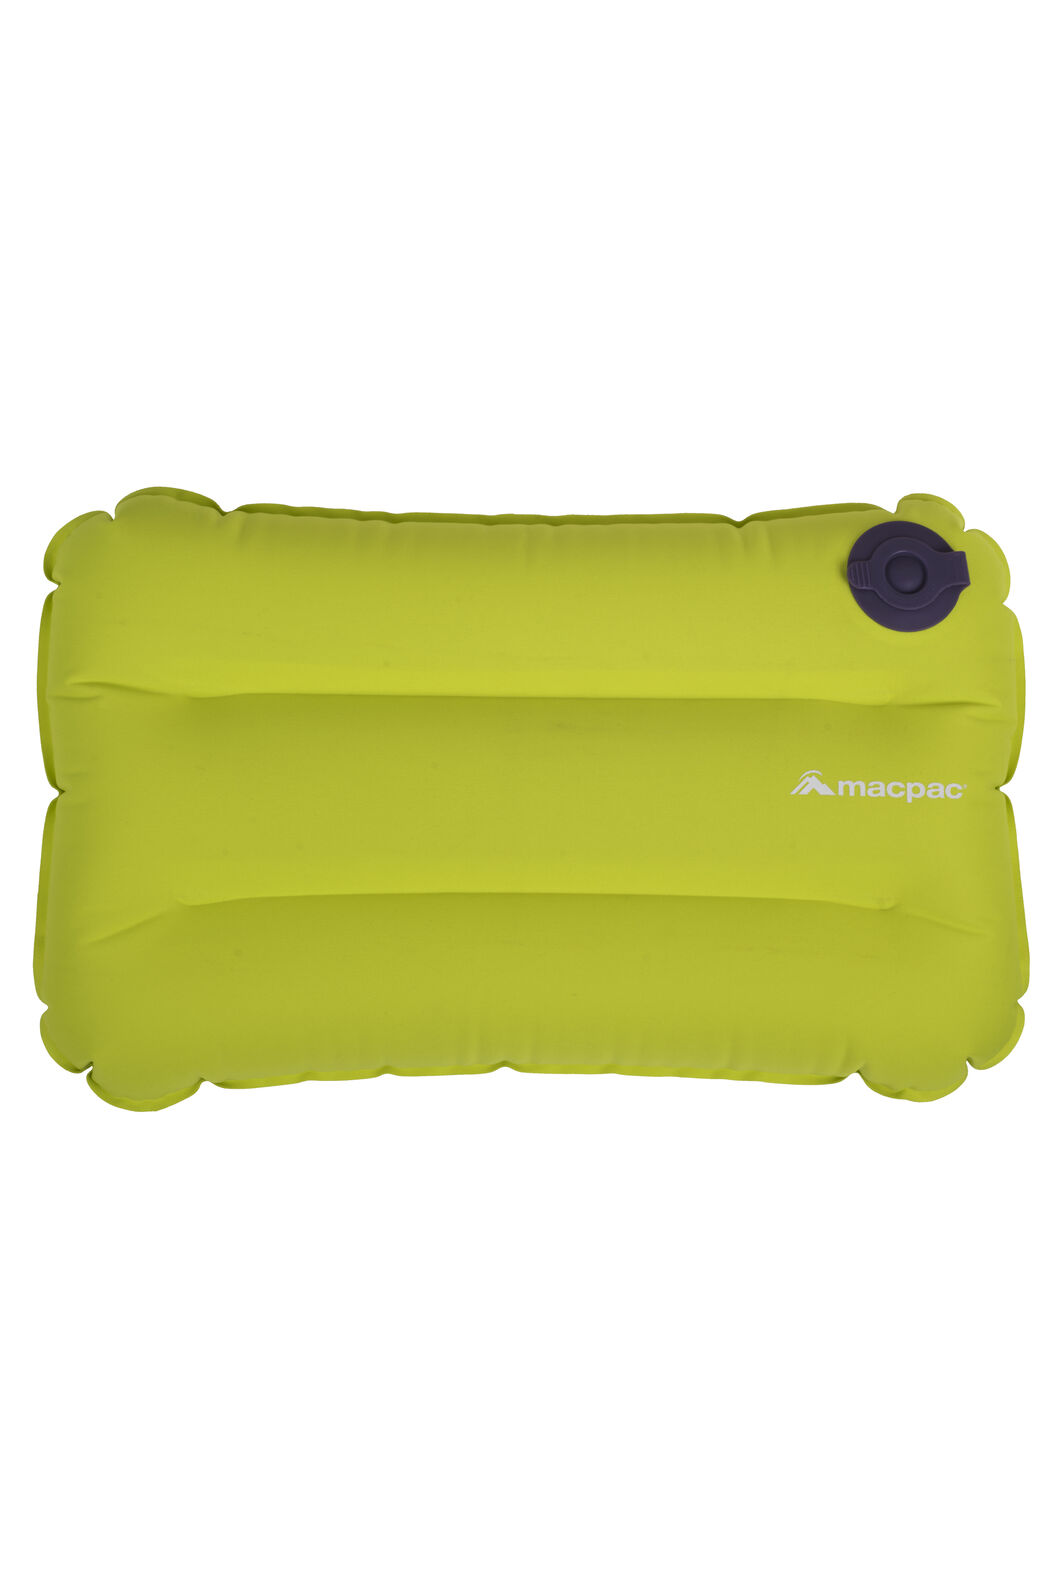 Macpac Inflatable Pillow, Green, hi-res